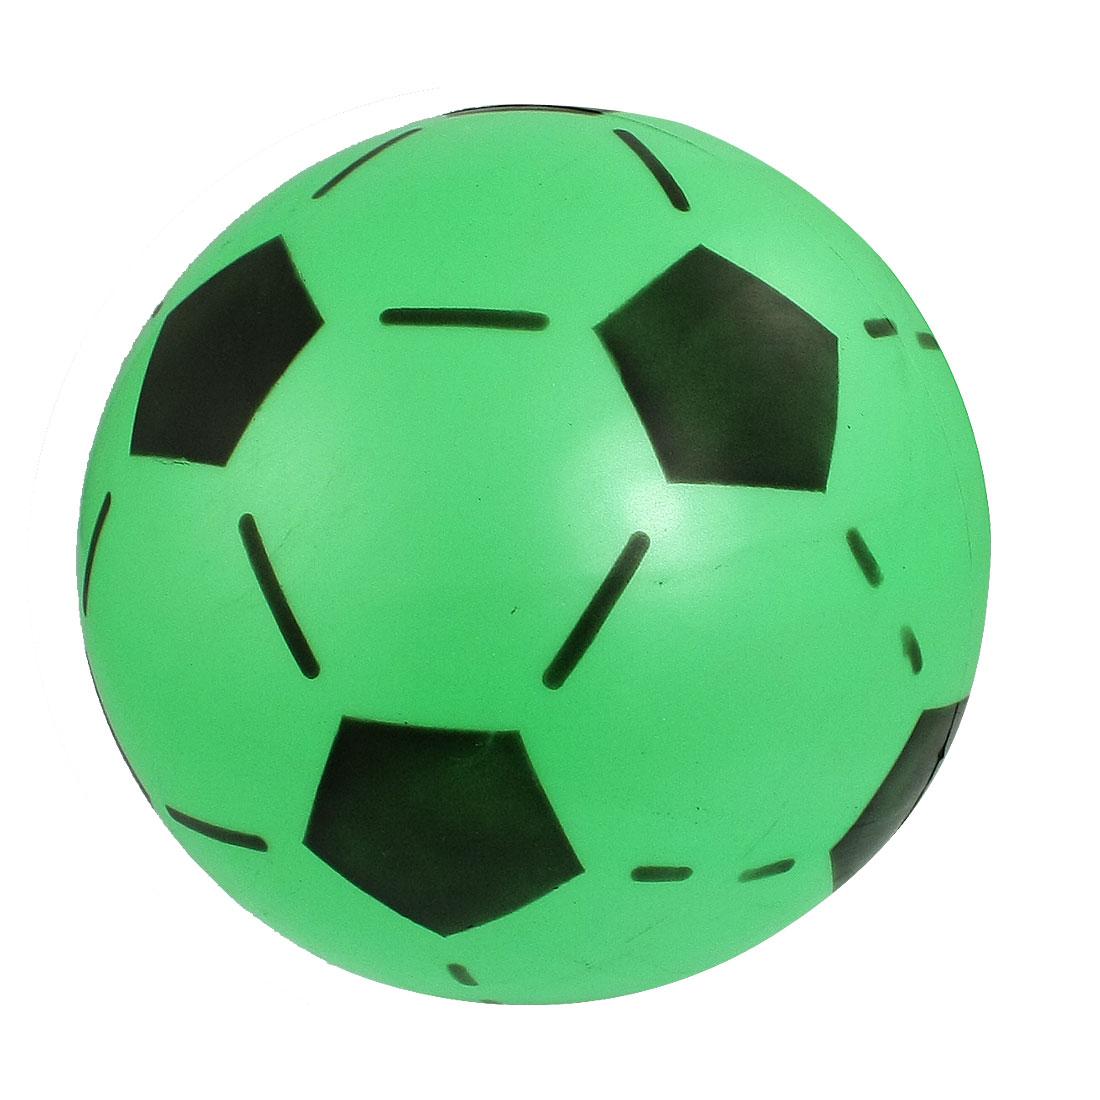 Green Black 16.8cm Diameter Soft Plastic Football Toy for